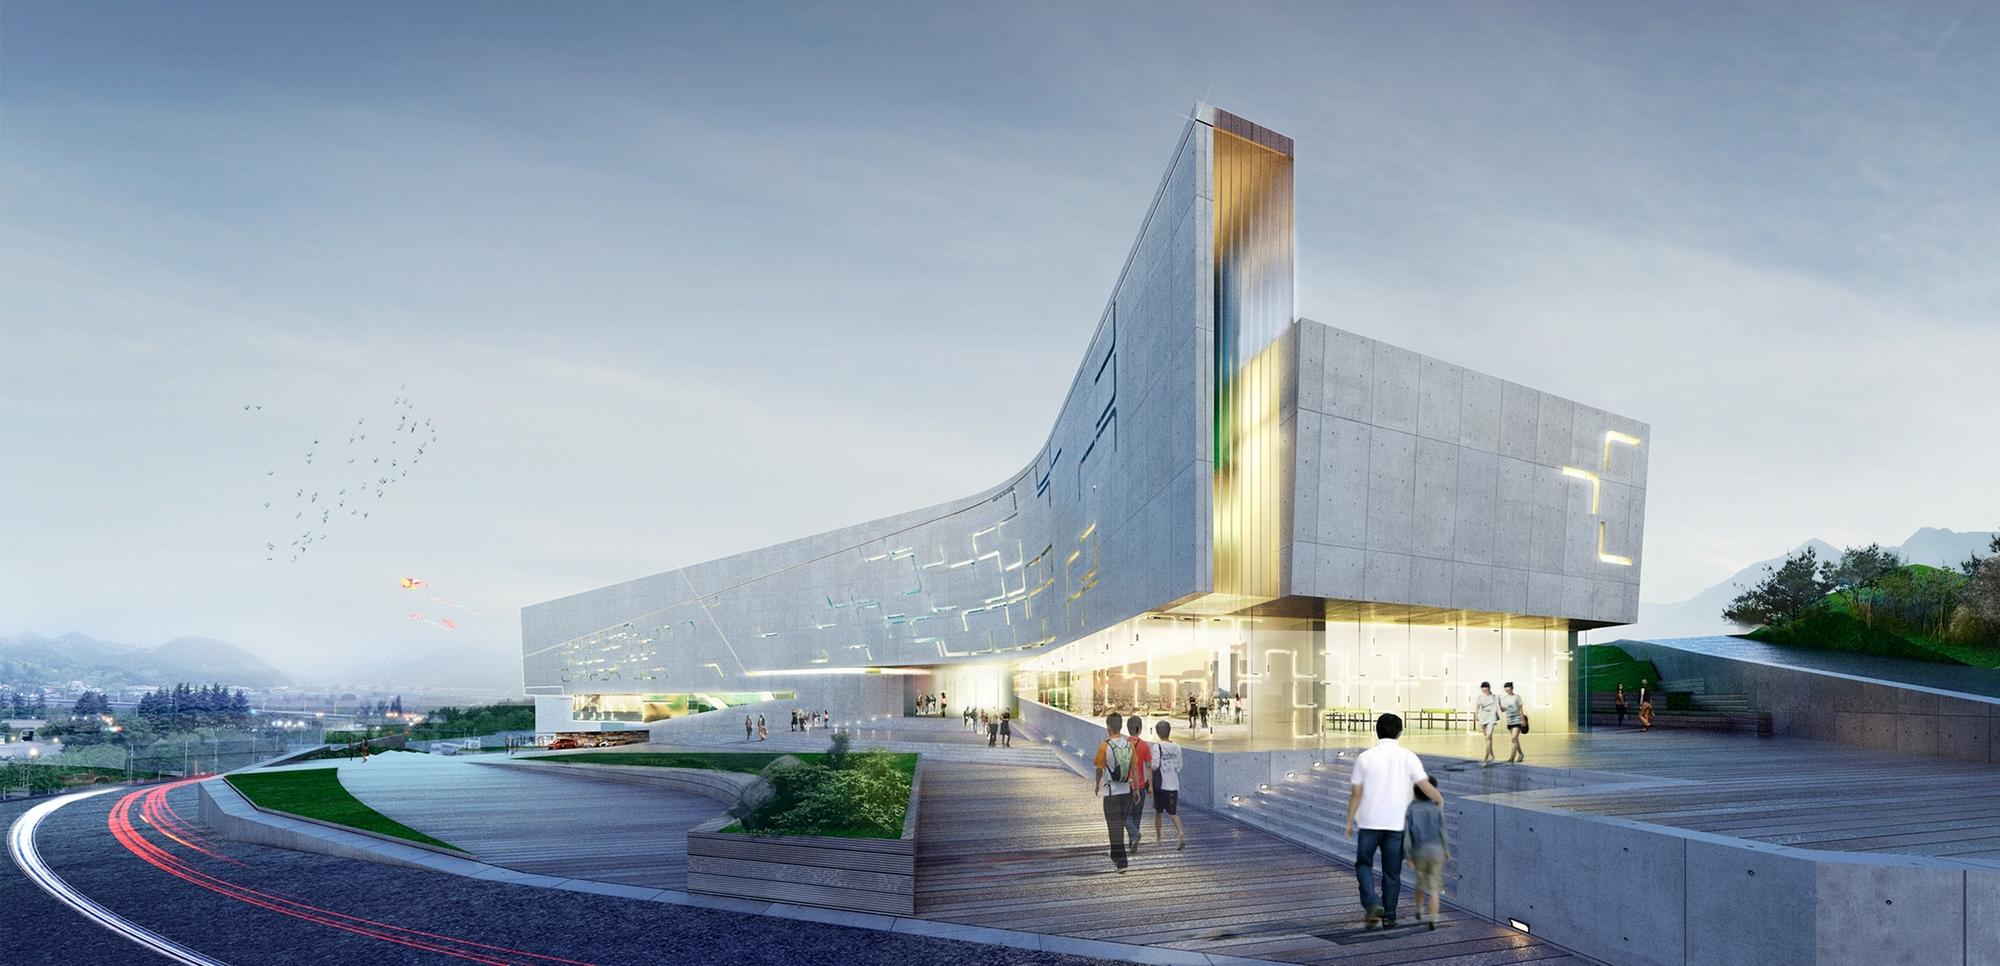 Sports Complex Project For The Daegu Gun Region City South Korea